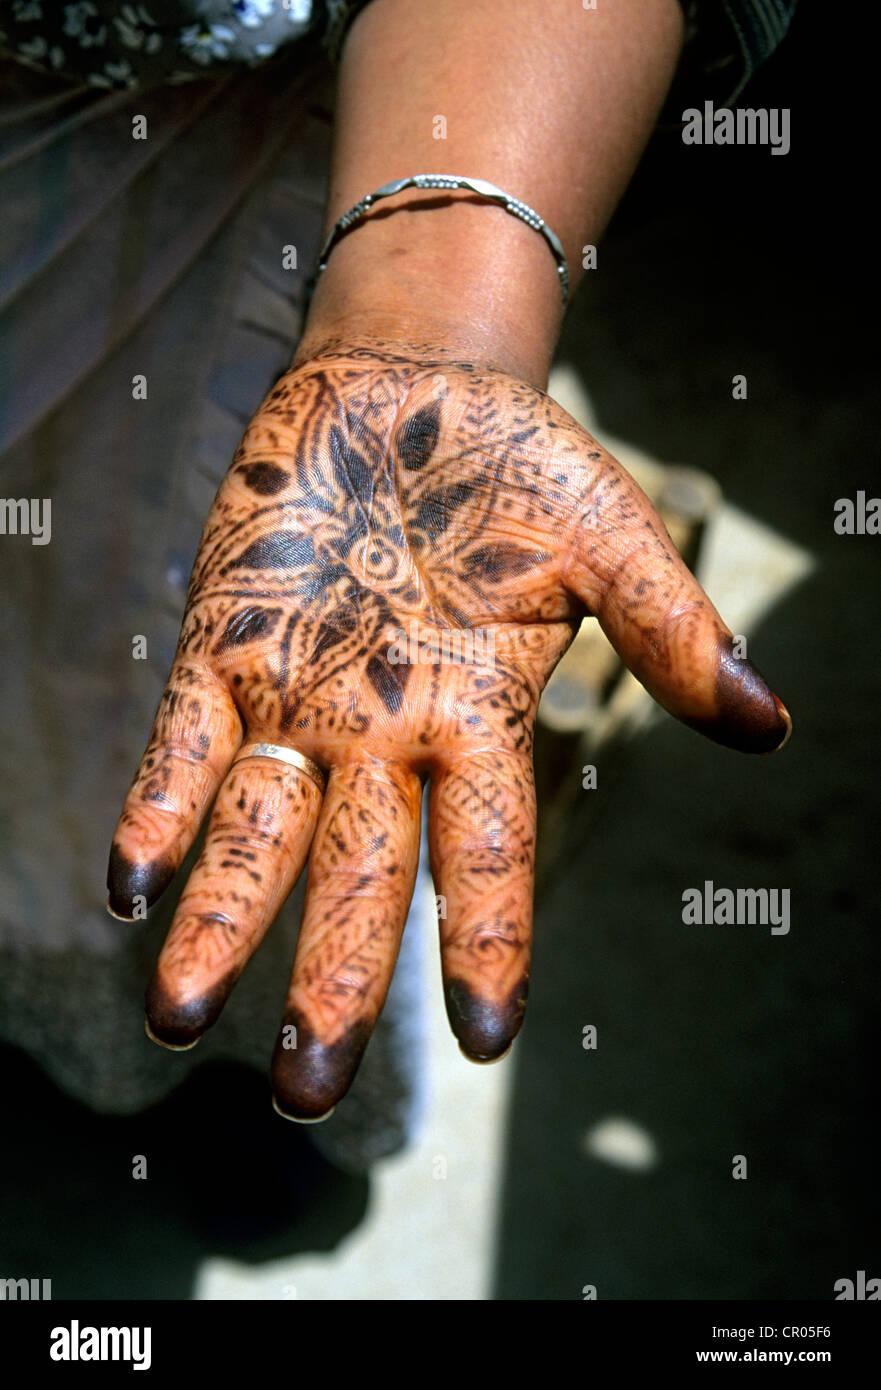 Morocco, High Atlas, Marrakesh, woman's hand with henna - Stock Image